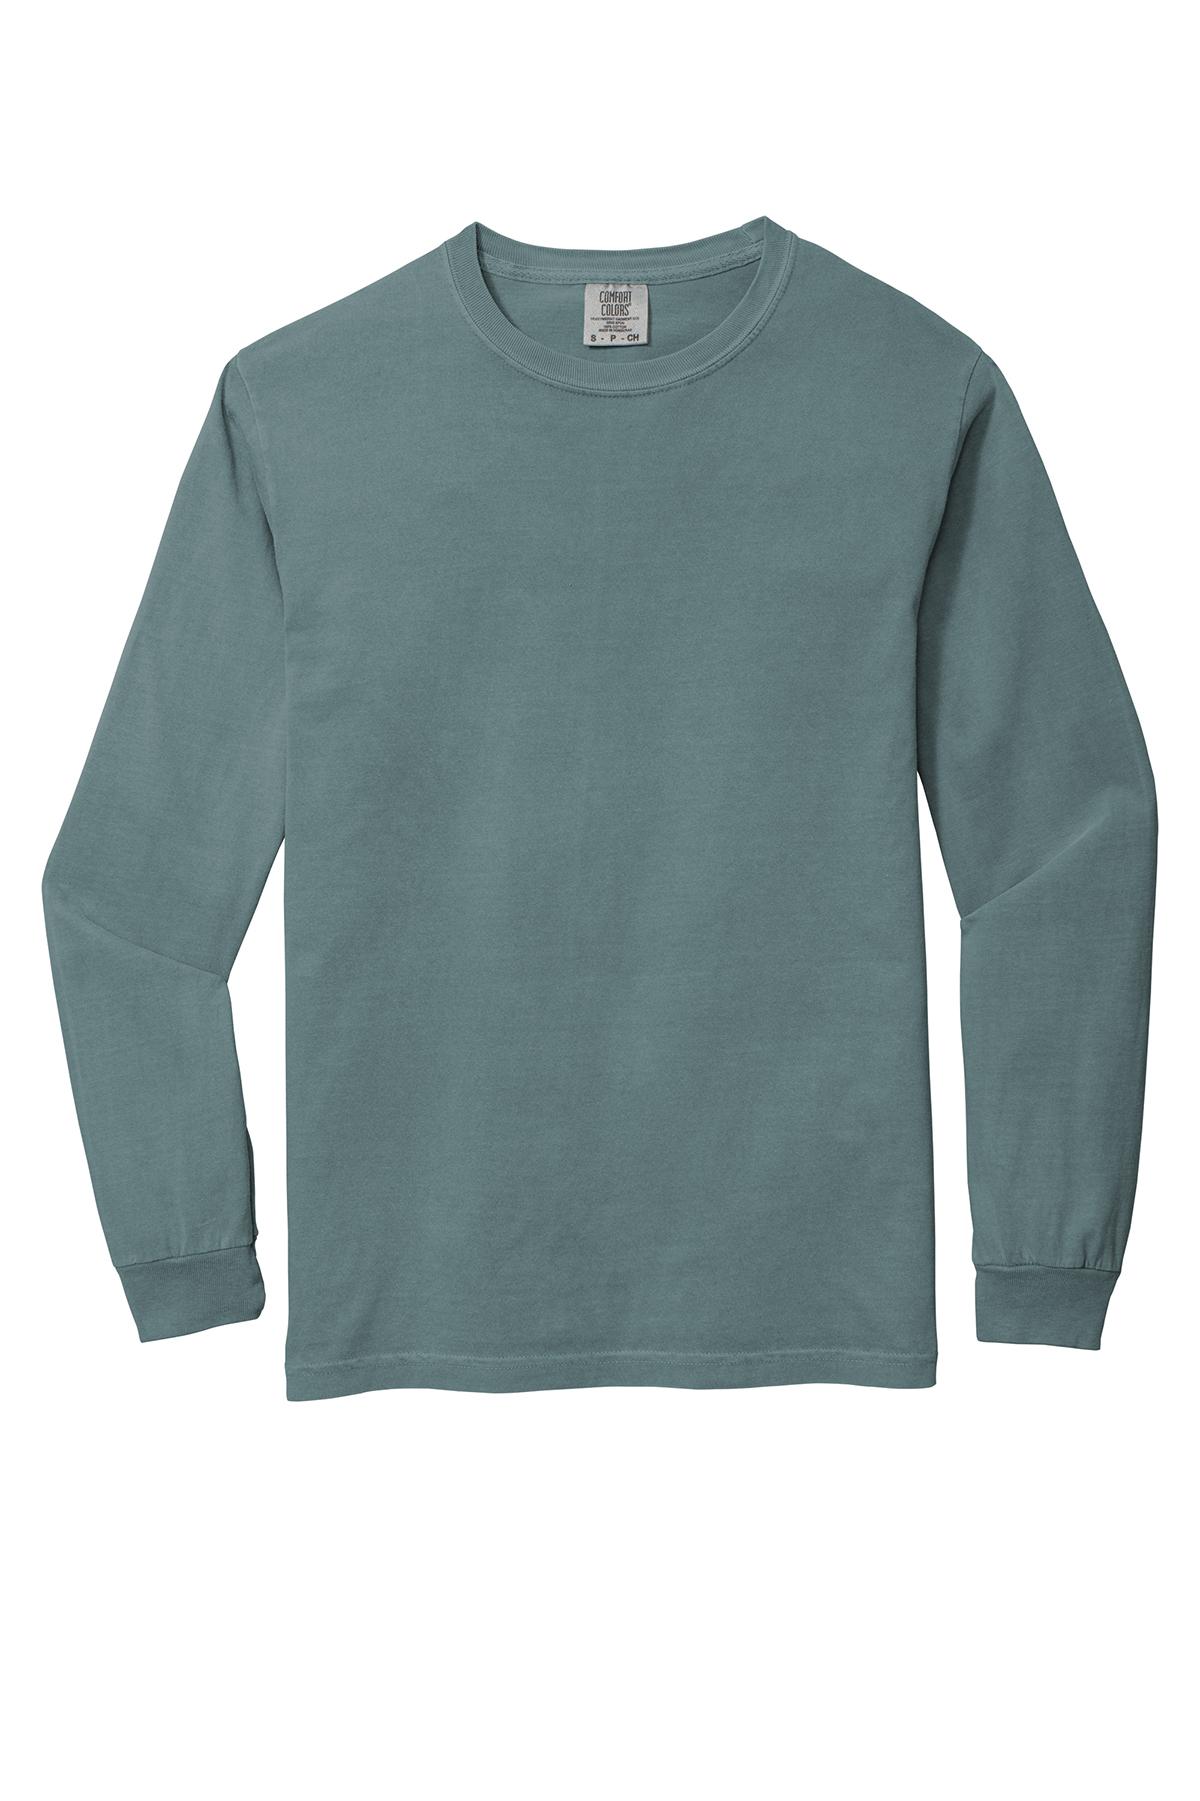 Comfort Colors ® Heavyweight Ring Spun Long Sleeve Tee | Comfort